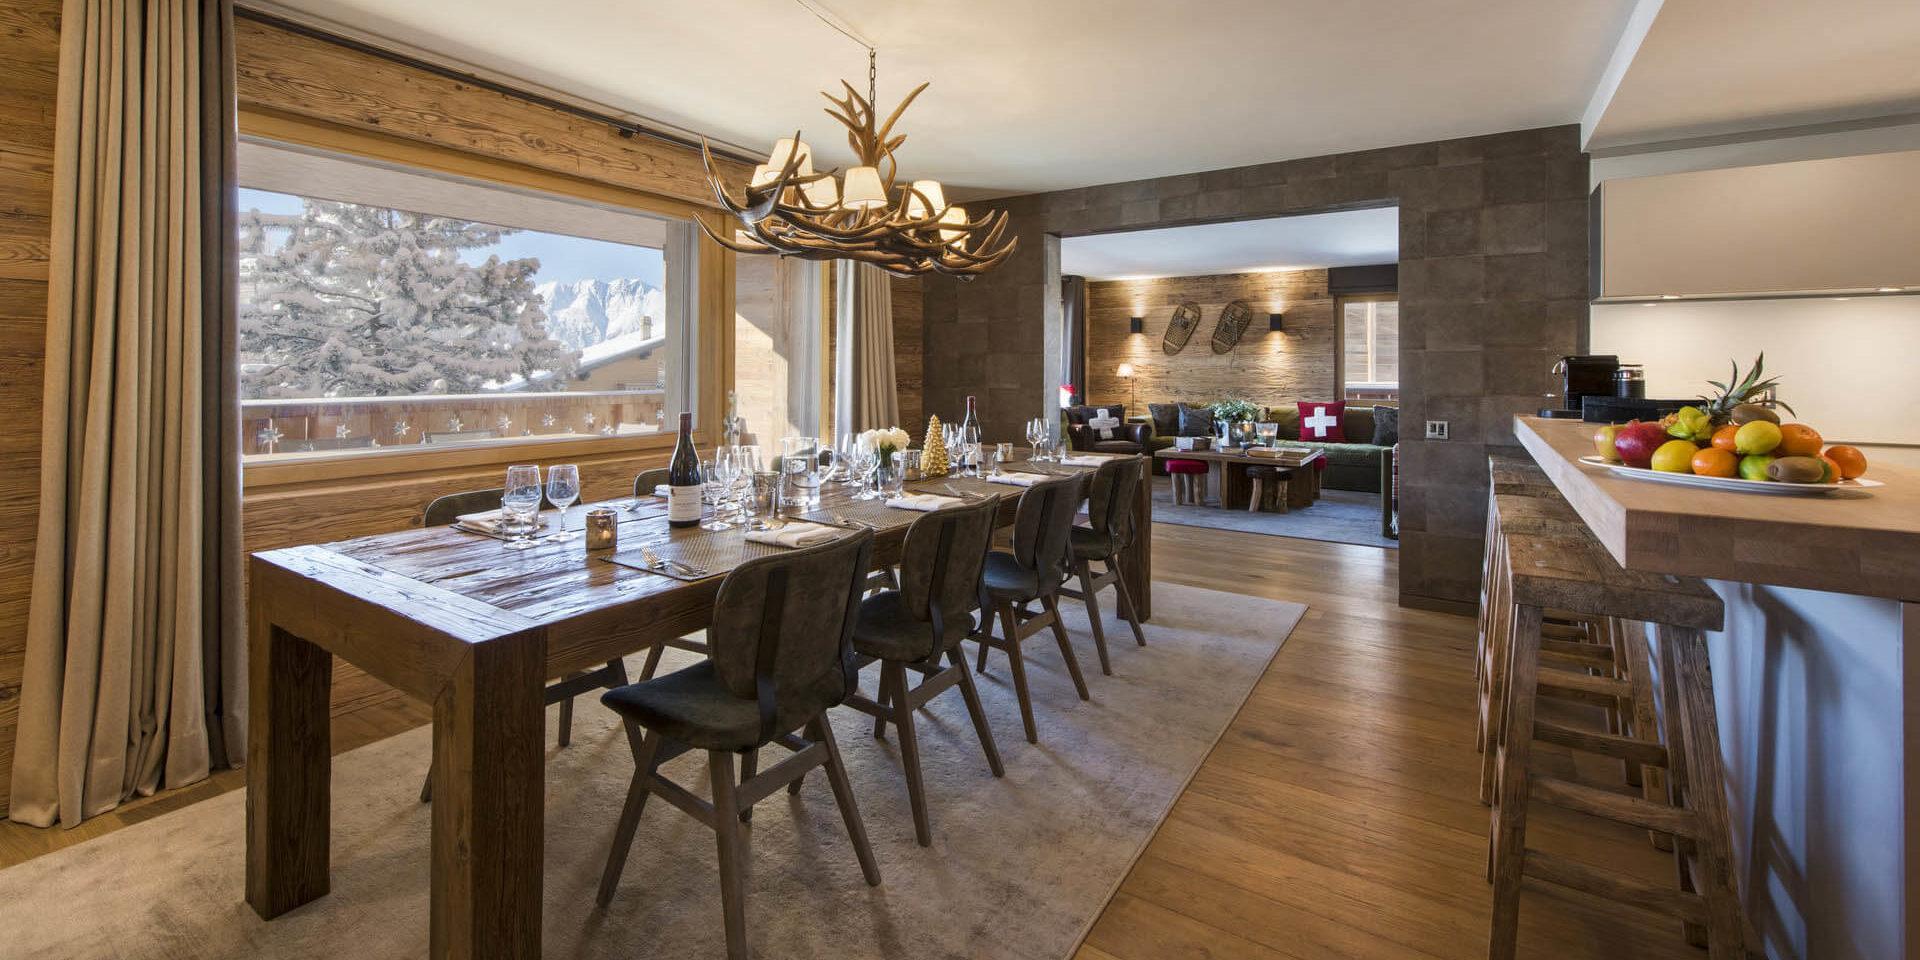 Appartement Rosalp 4 Verbier Les 4 Vallees Zwitserland wintersport skivakantie luxe eetkamer gedekte tafel kroonluchter hout bar barkrukken vers fruit living bank kussens